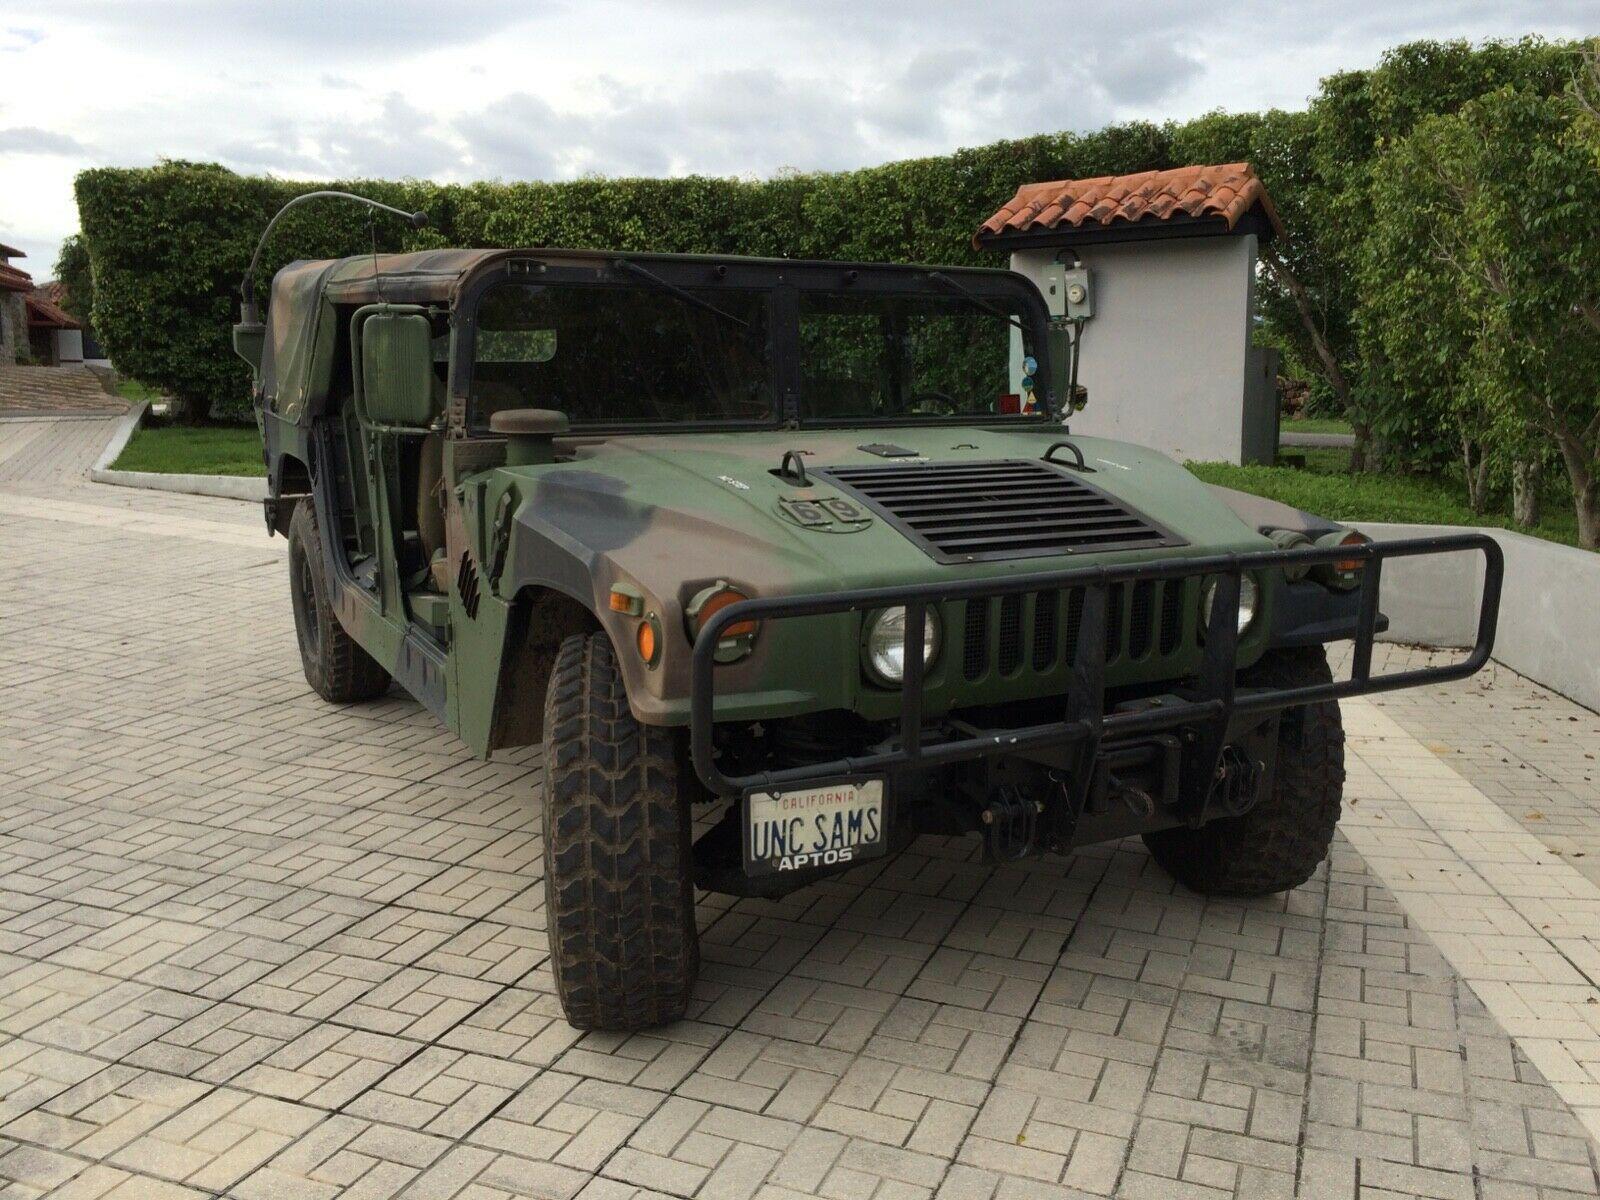 Completely Restored 1987 AM General Humvee M988